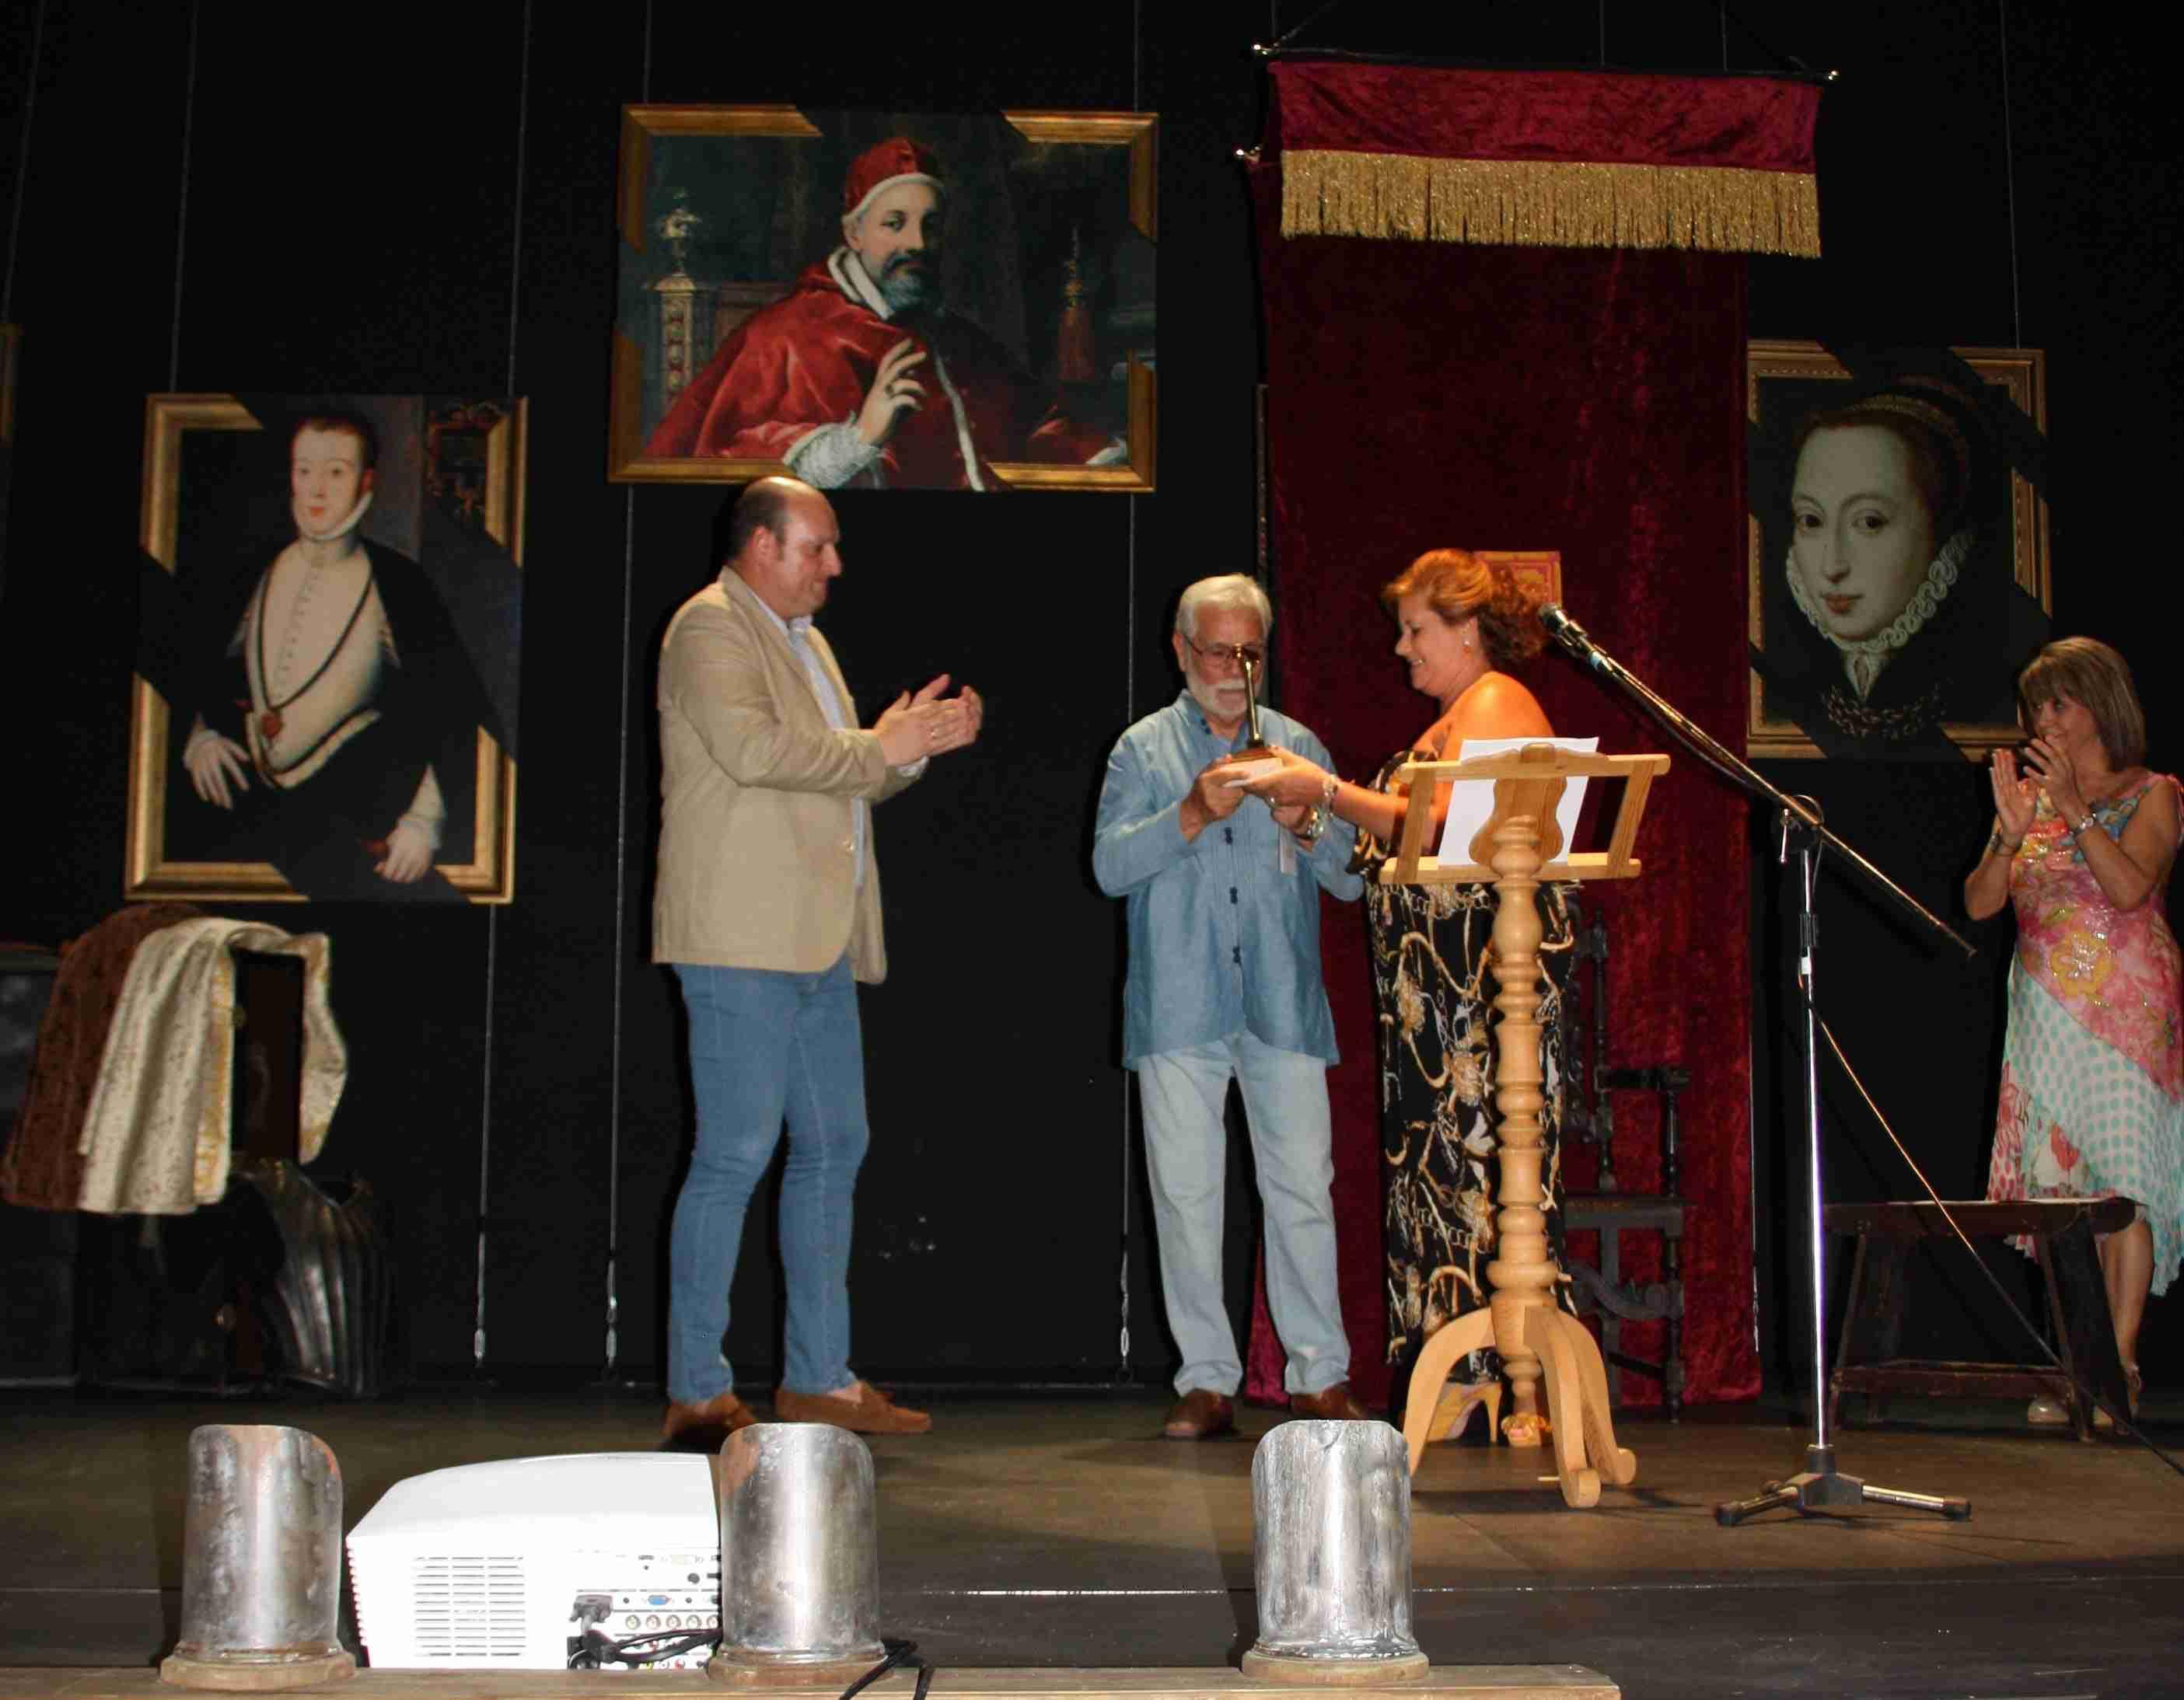 Merecido homenaje a Manuel Canseco, en el 9º Festival de Teatro y Títeres de Torralba de Calatrava 14